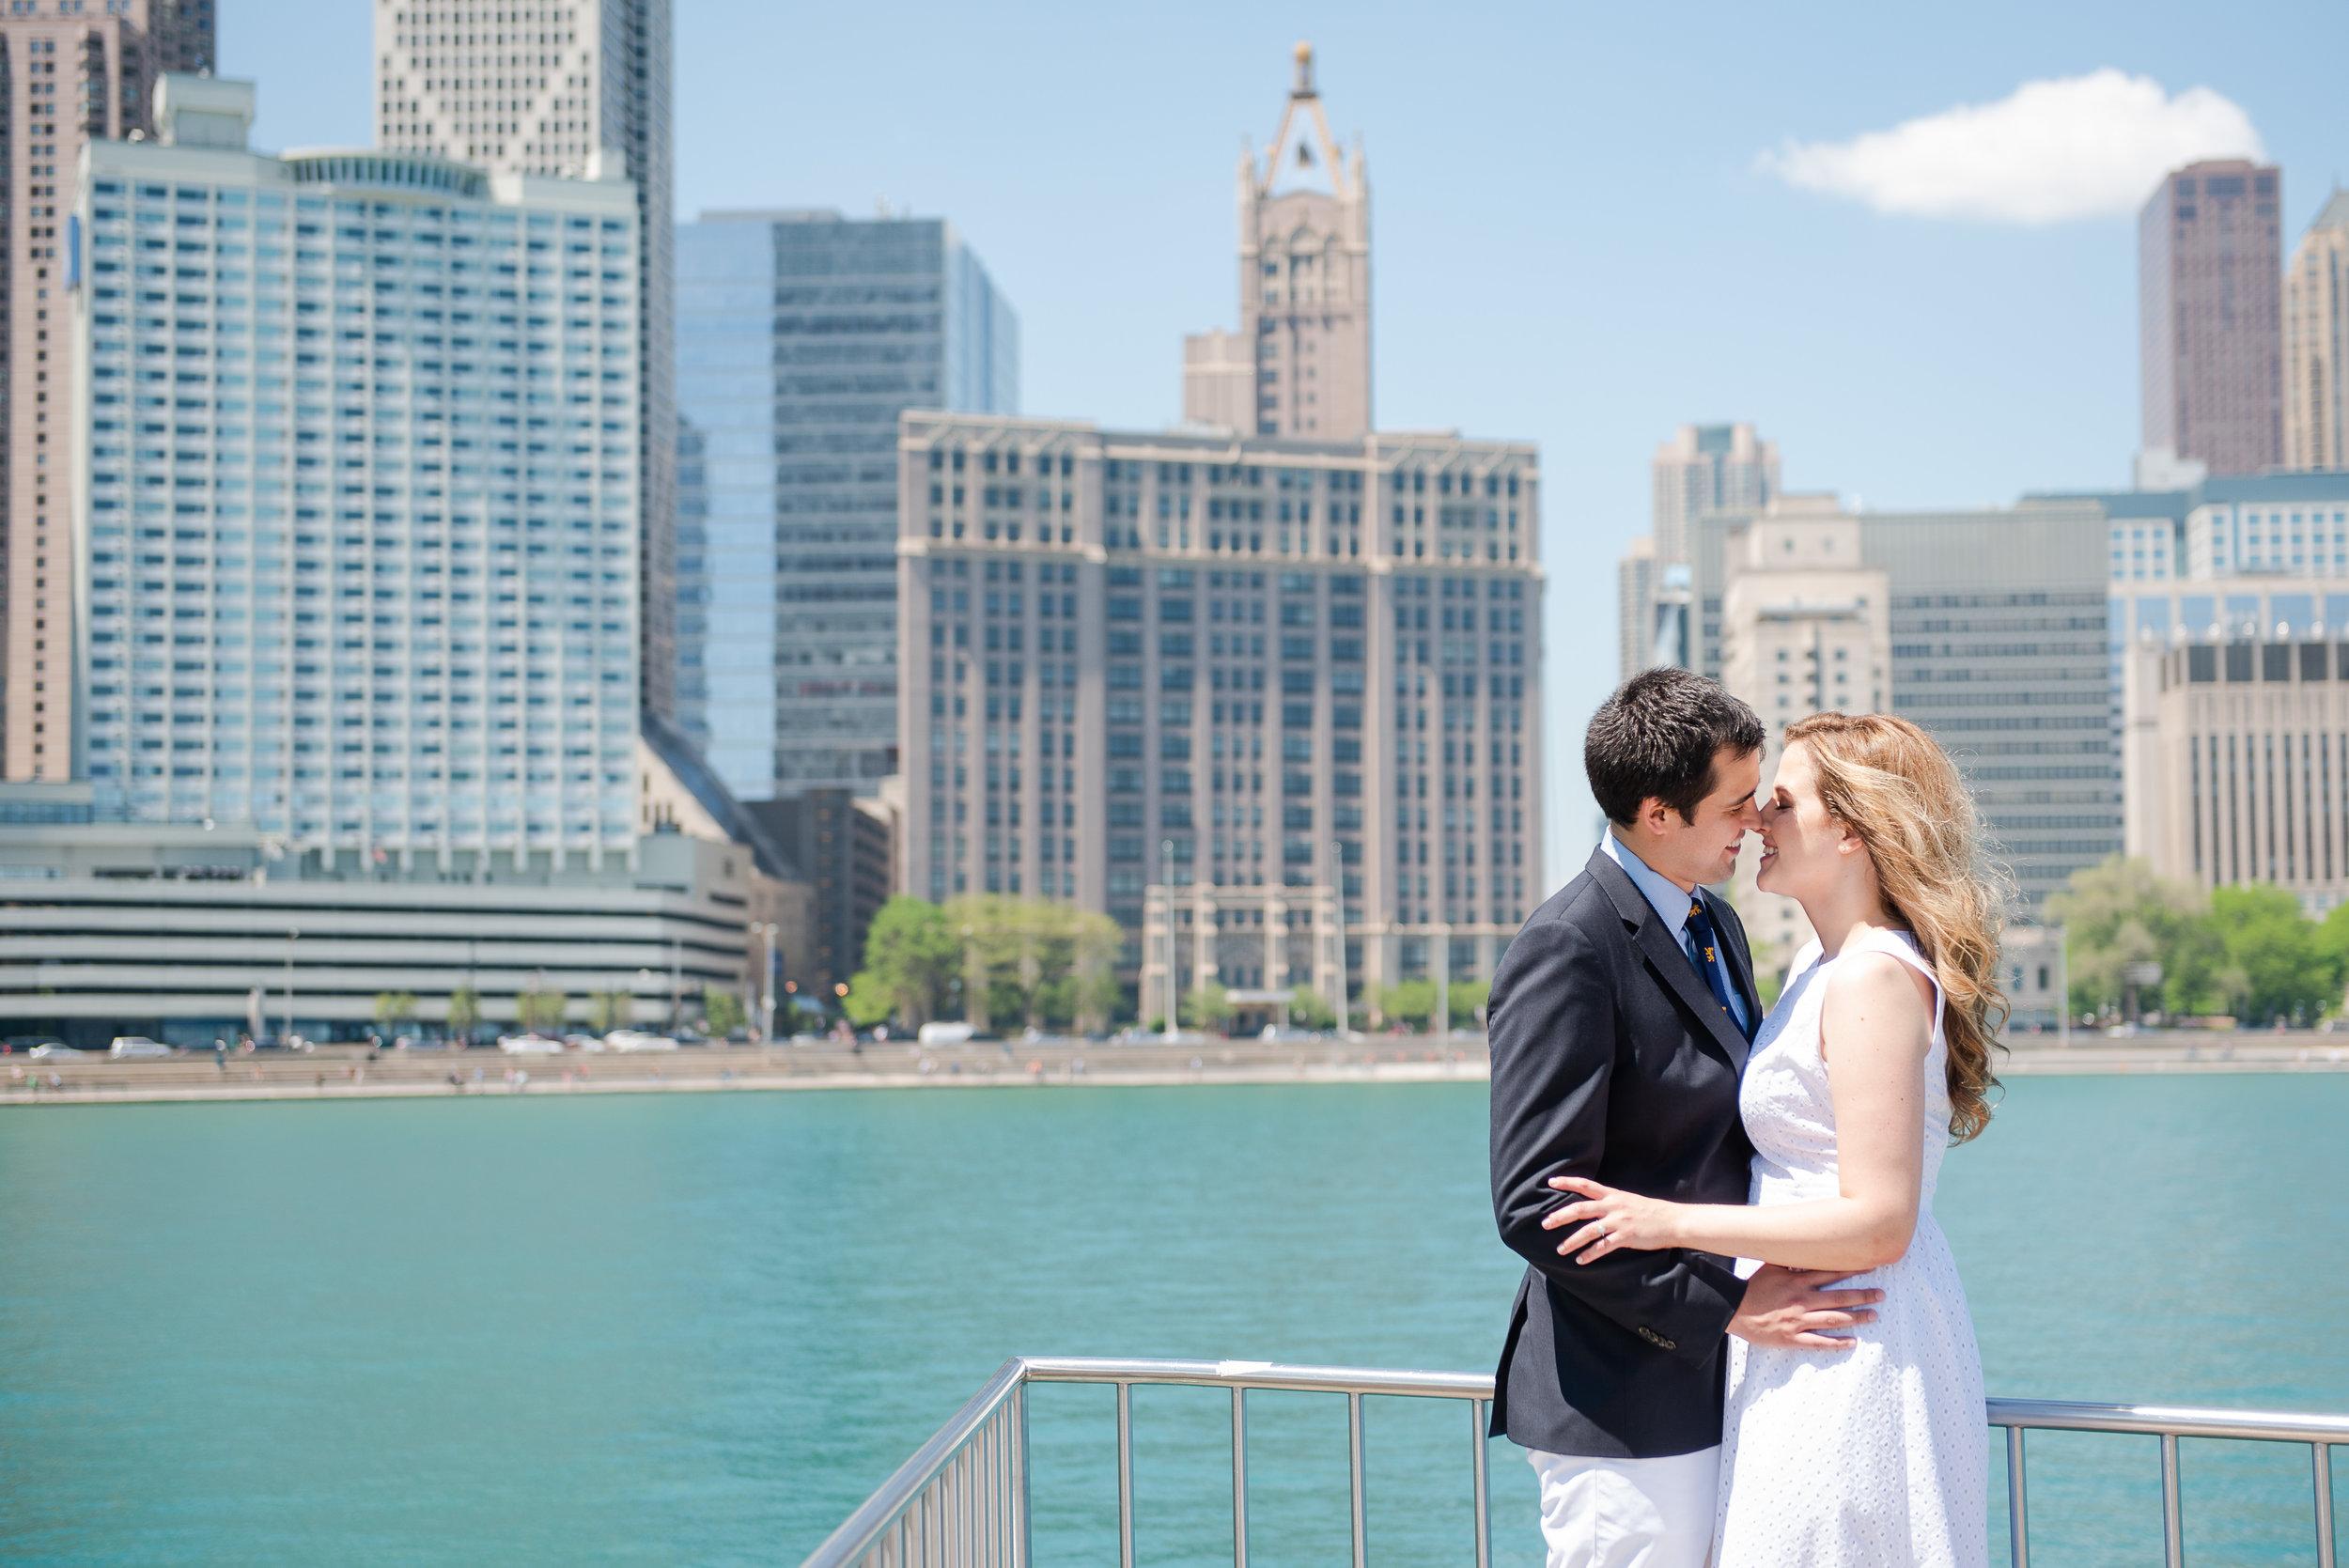 Chicago-downtown-summer-engagement-session-Kimberly-Hernan-MettsPhoto-2.jpg